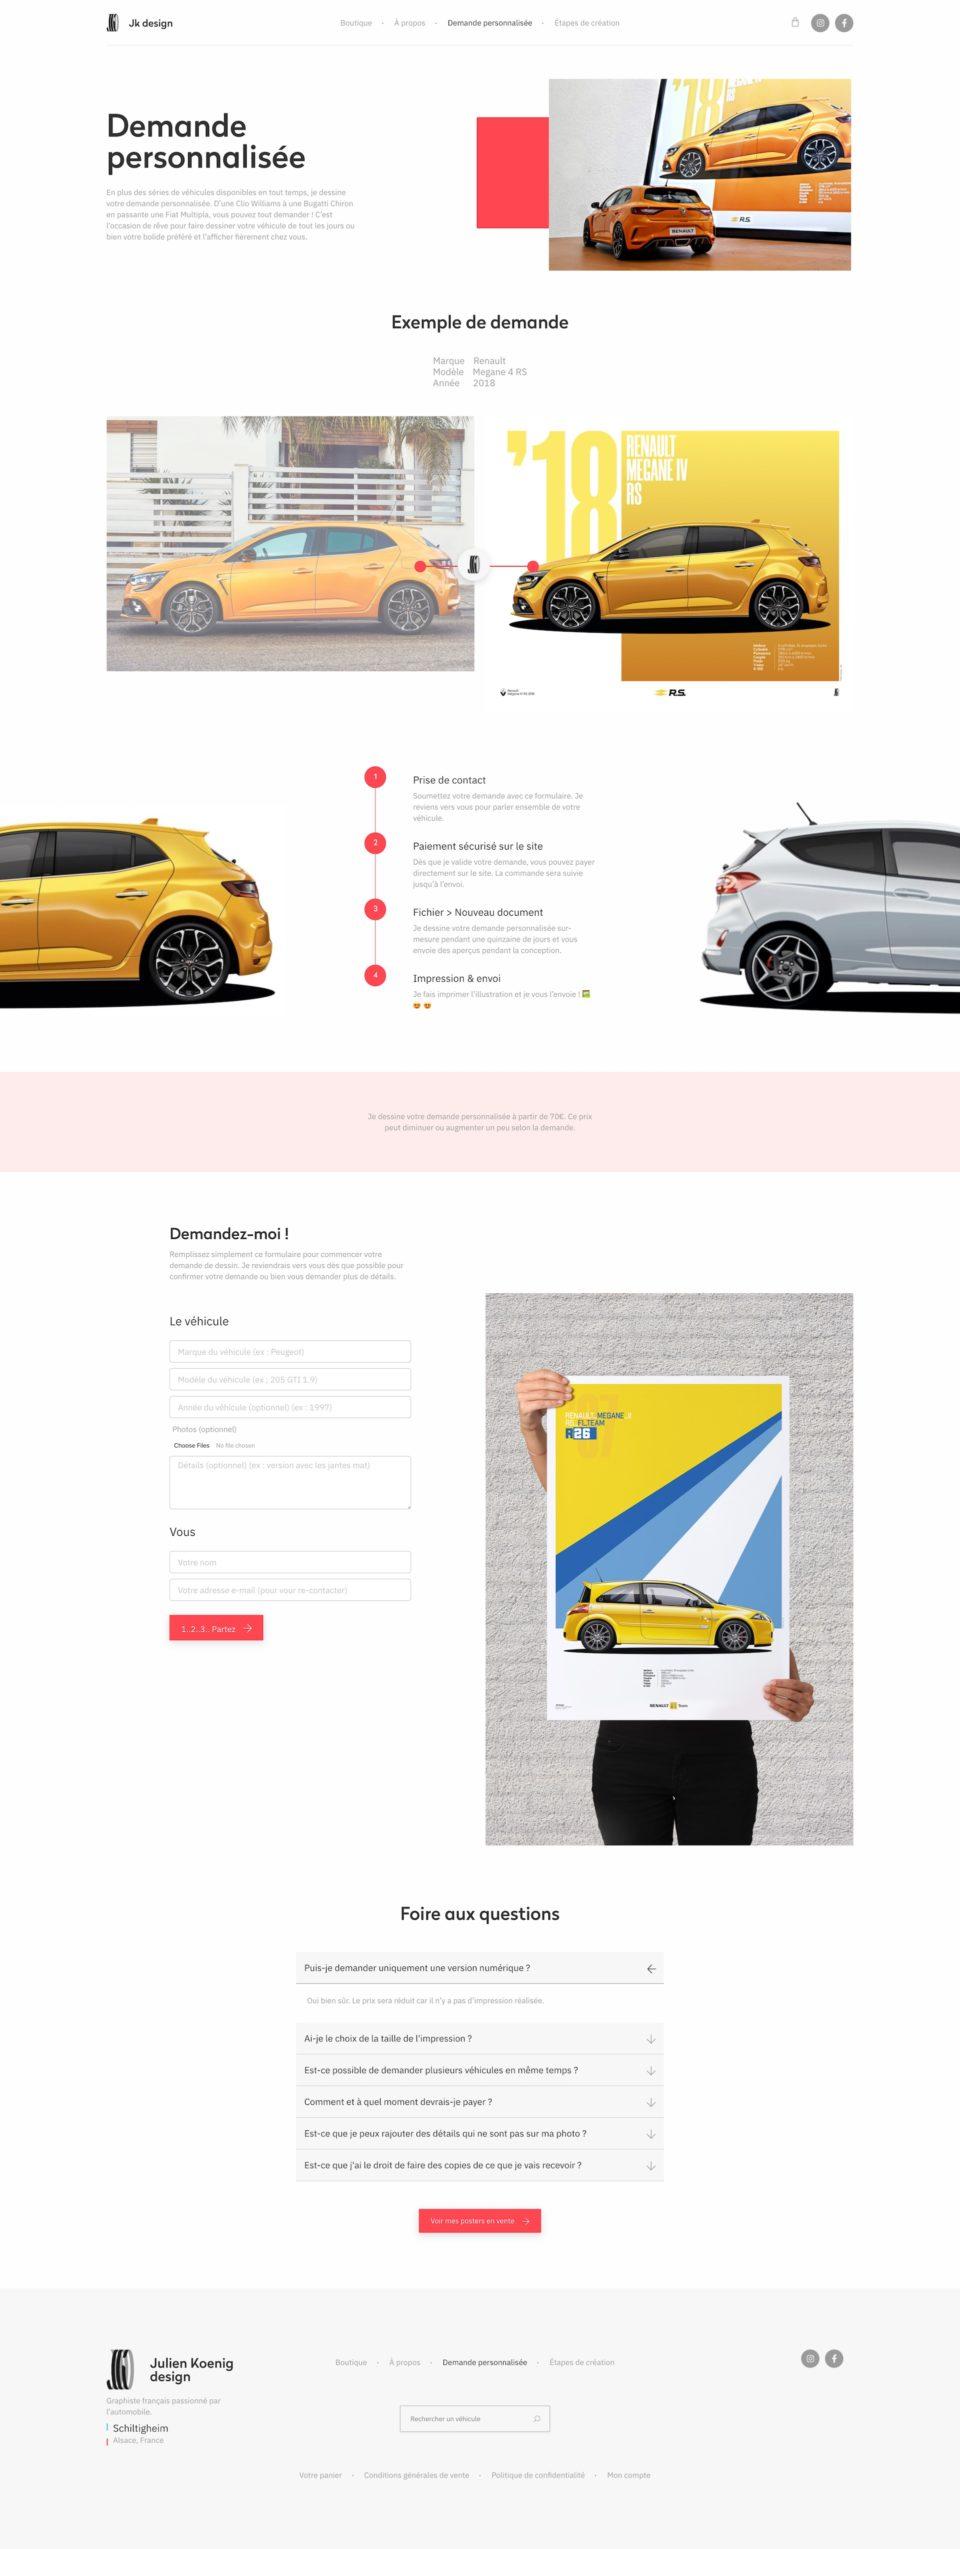 jk-design-page-demande-personnalisee